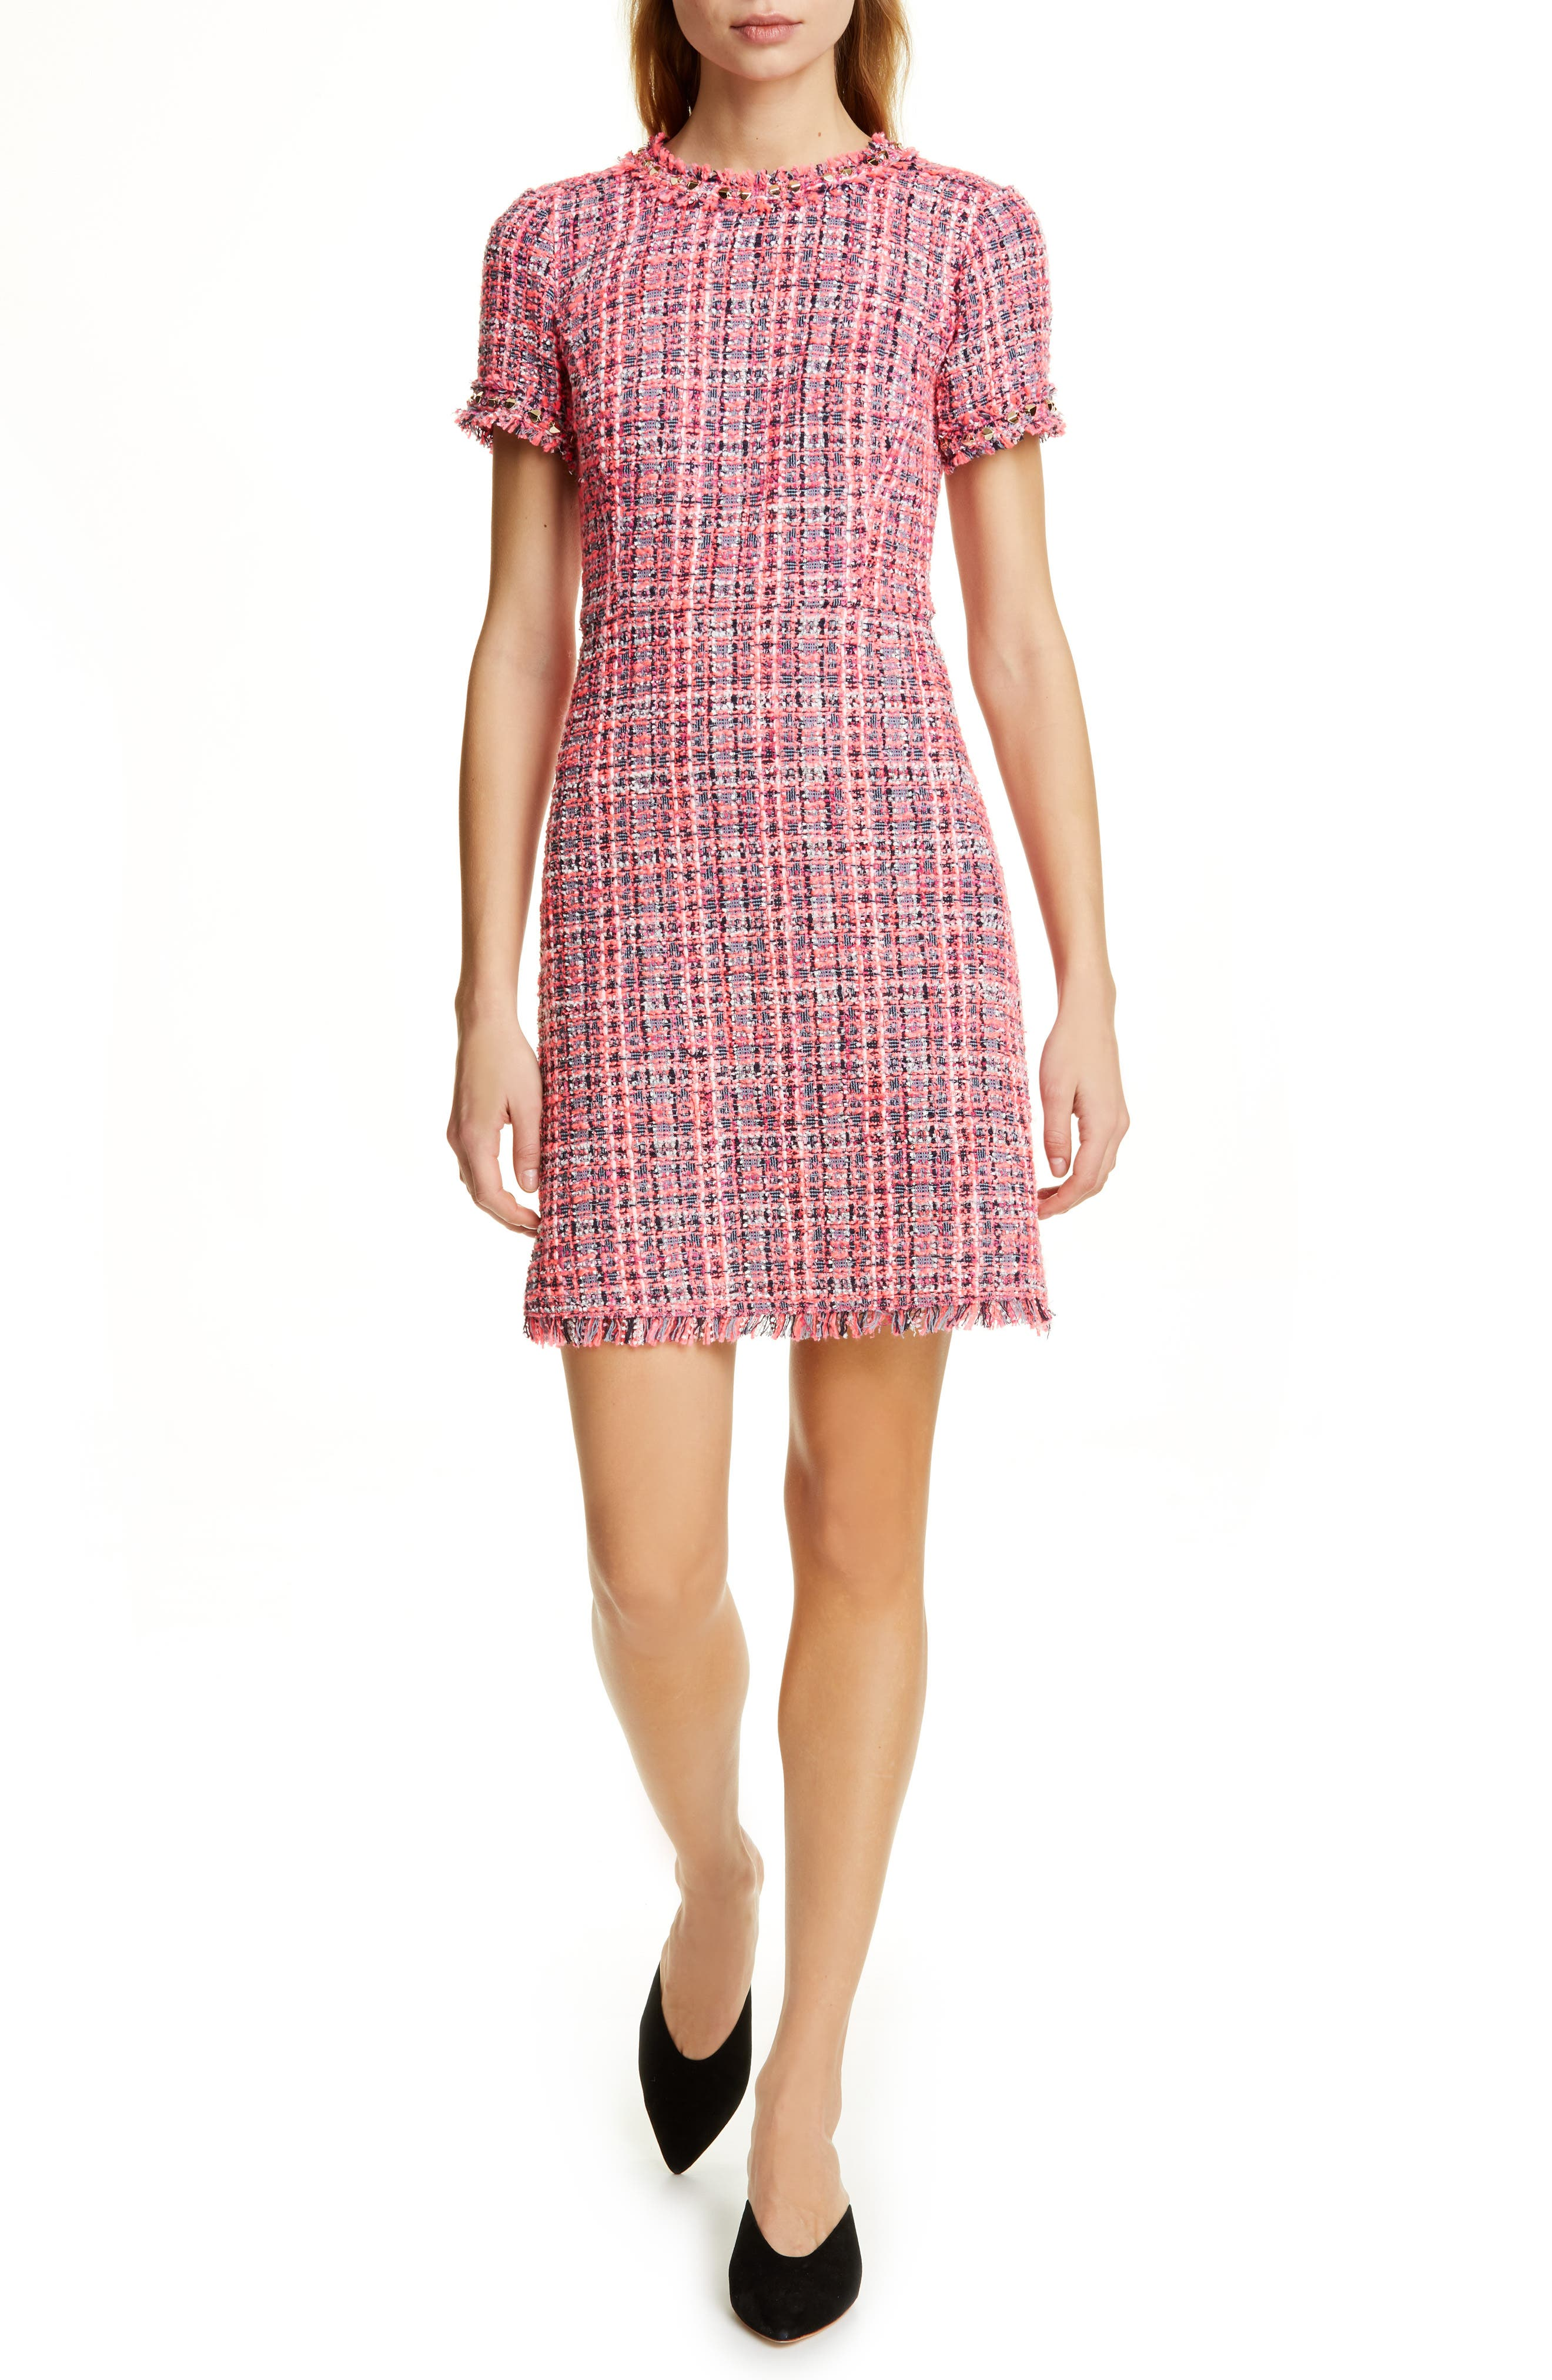 Kate Spade Sale Dresses